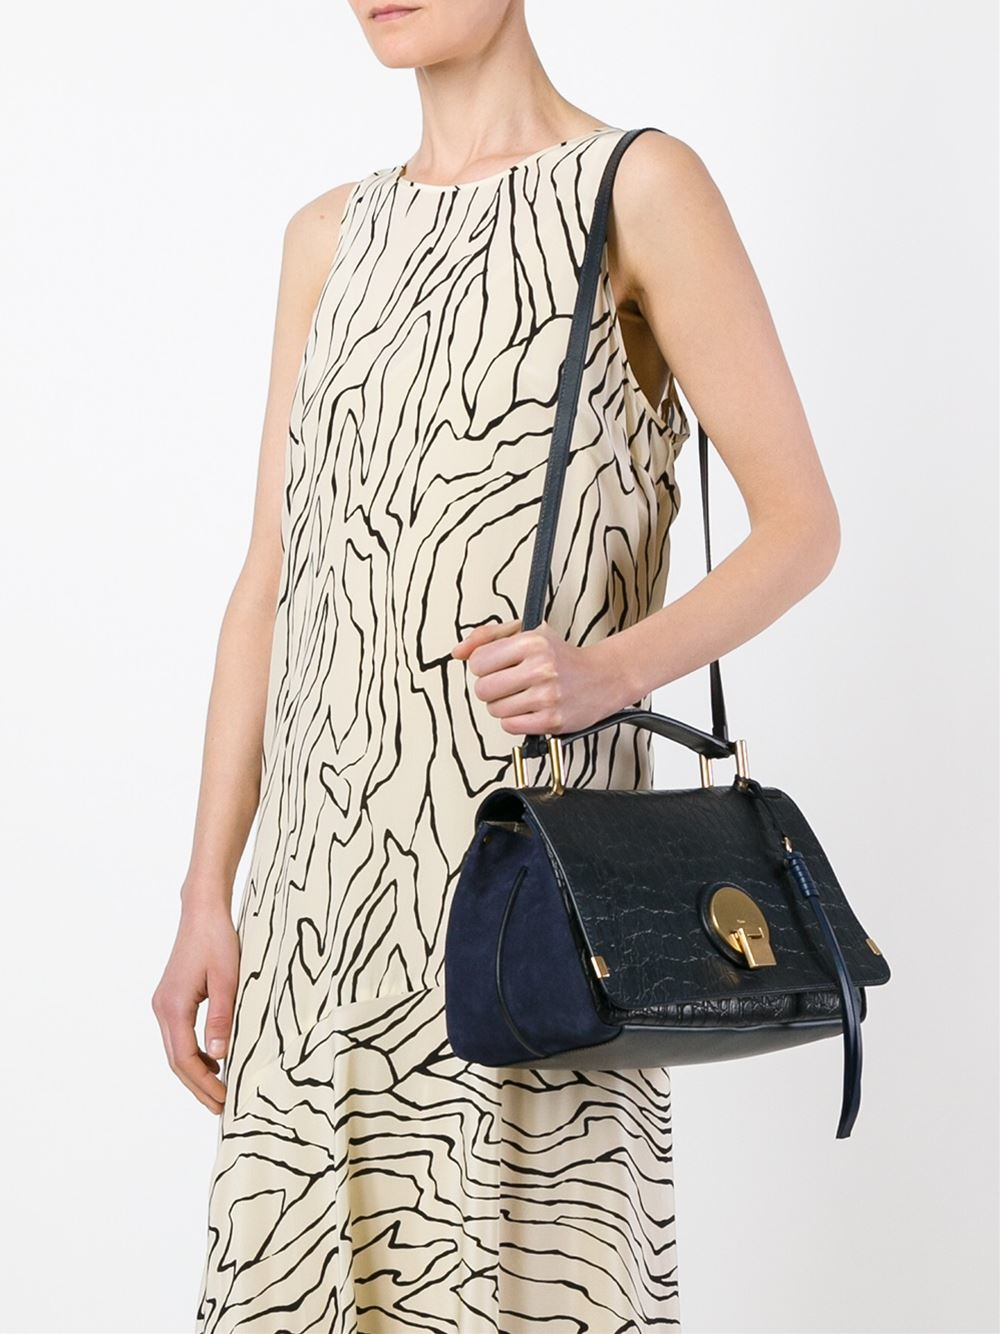 replica chloe handbags - Chlo�� Crocodile Effect Indy Tote in Blue | Lyst